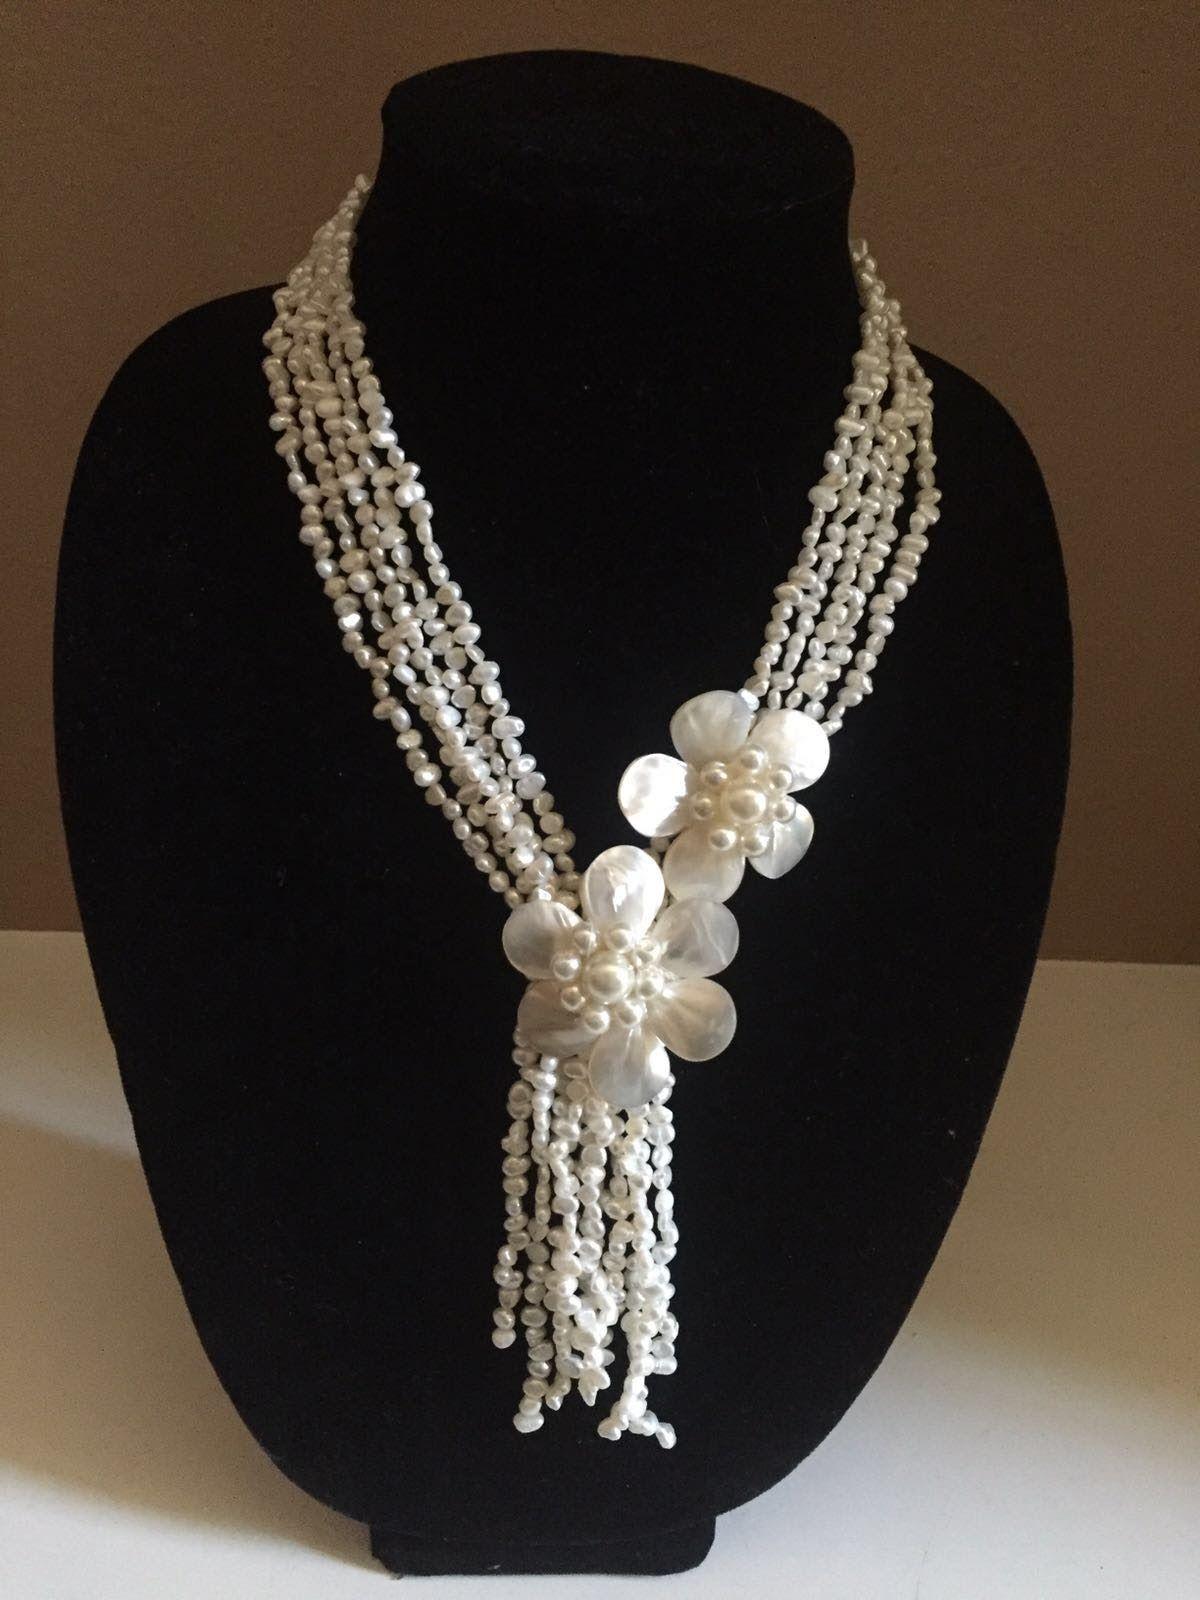 f9a106de3712 Como Hacer un Collar de Perlas - YouTube